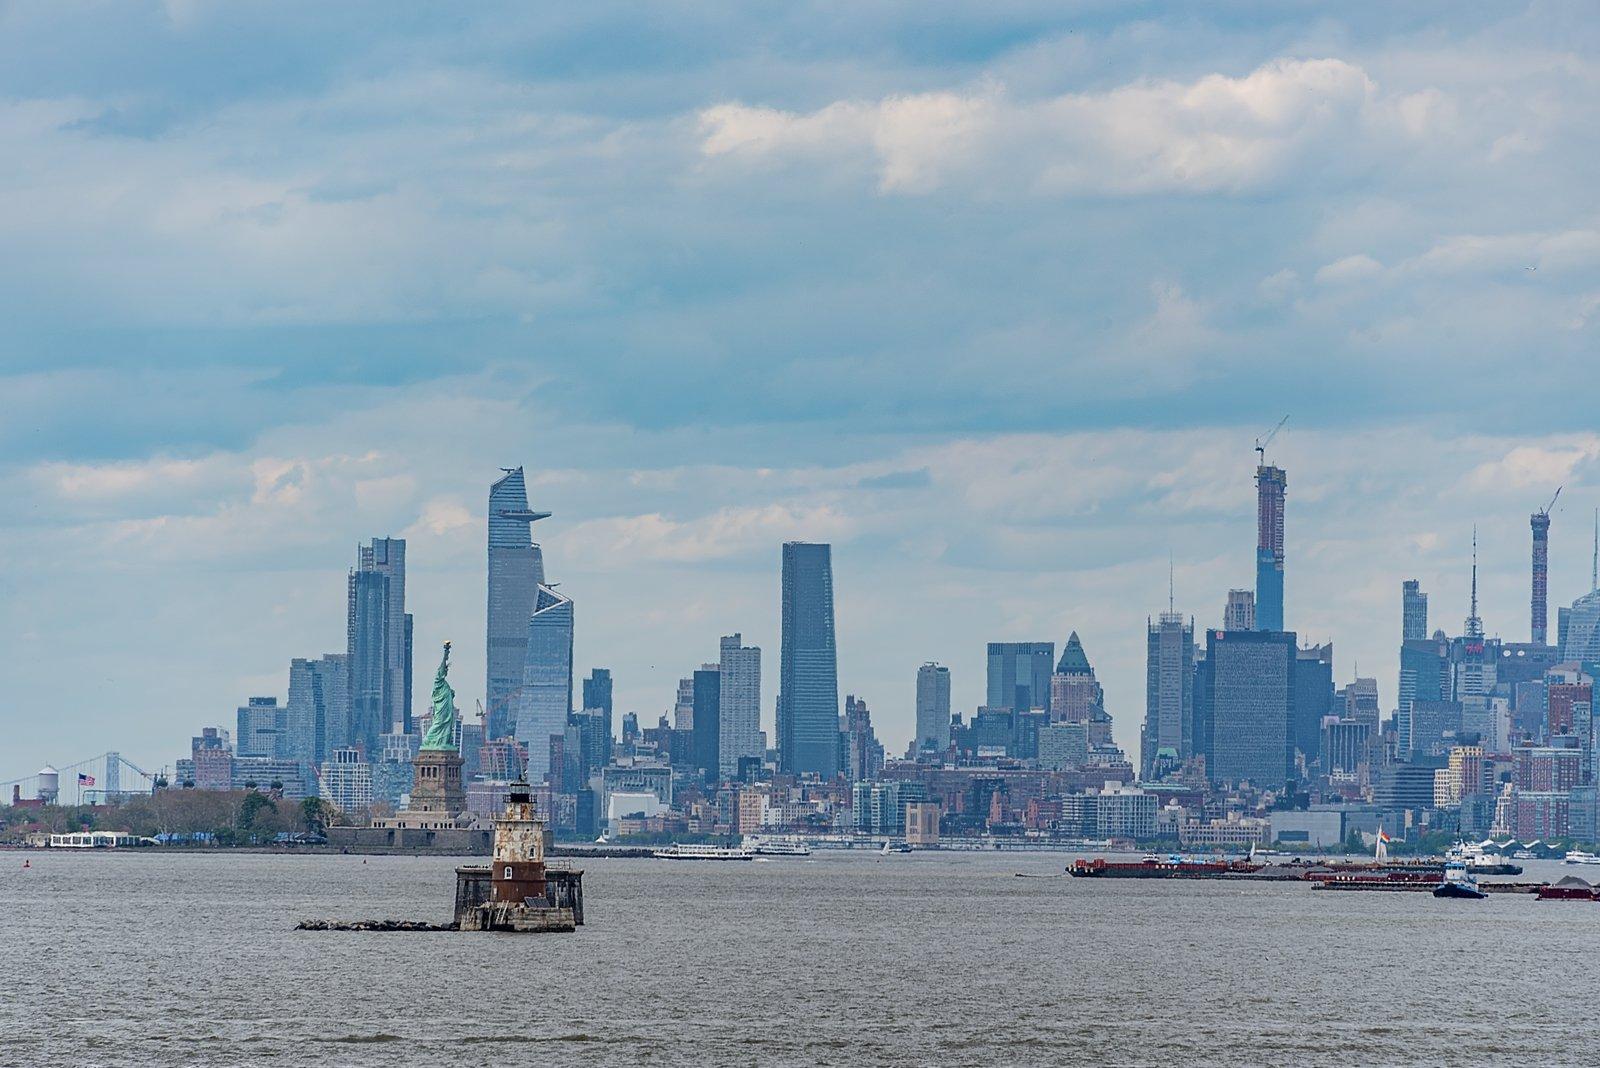 Stapleton Staten Island, NY Private Investigator